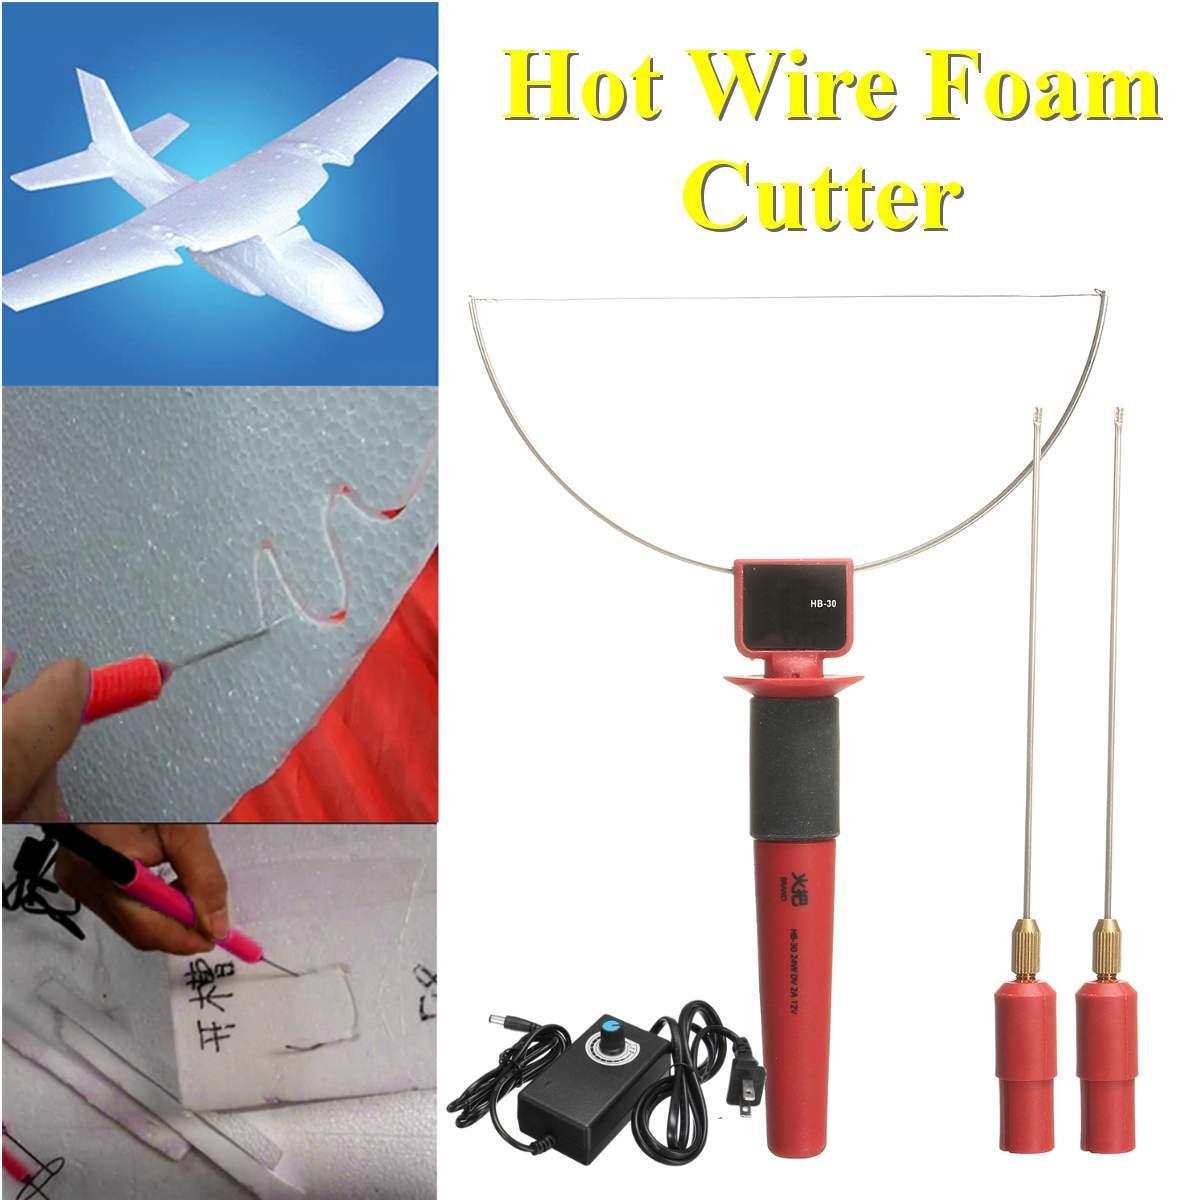 Cortador de espuma de fio quente elétrico isopor poliestireno artesanato diy modelo de mão máquina de corte de espuma ferramentas cortador de espuma elétrica arte